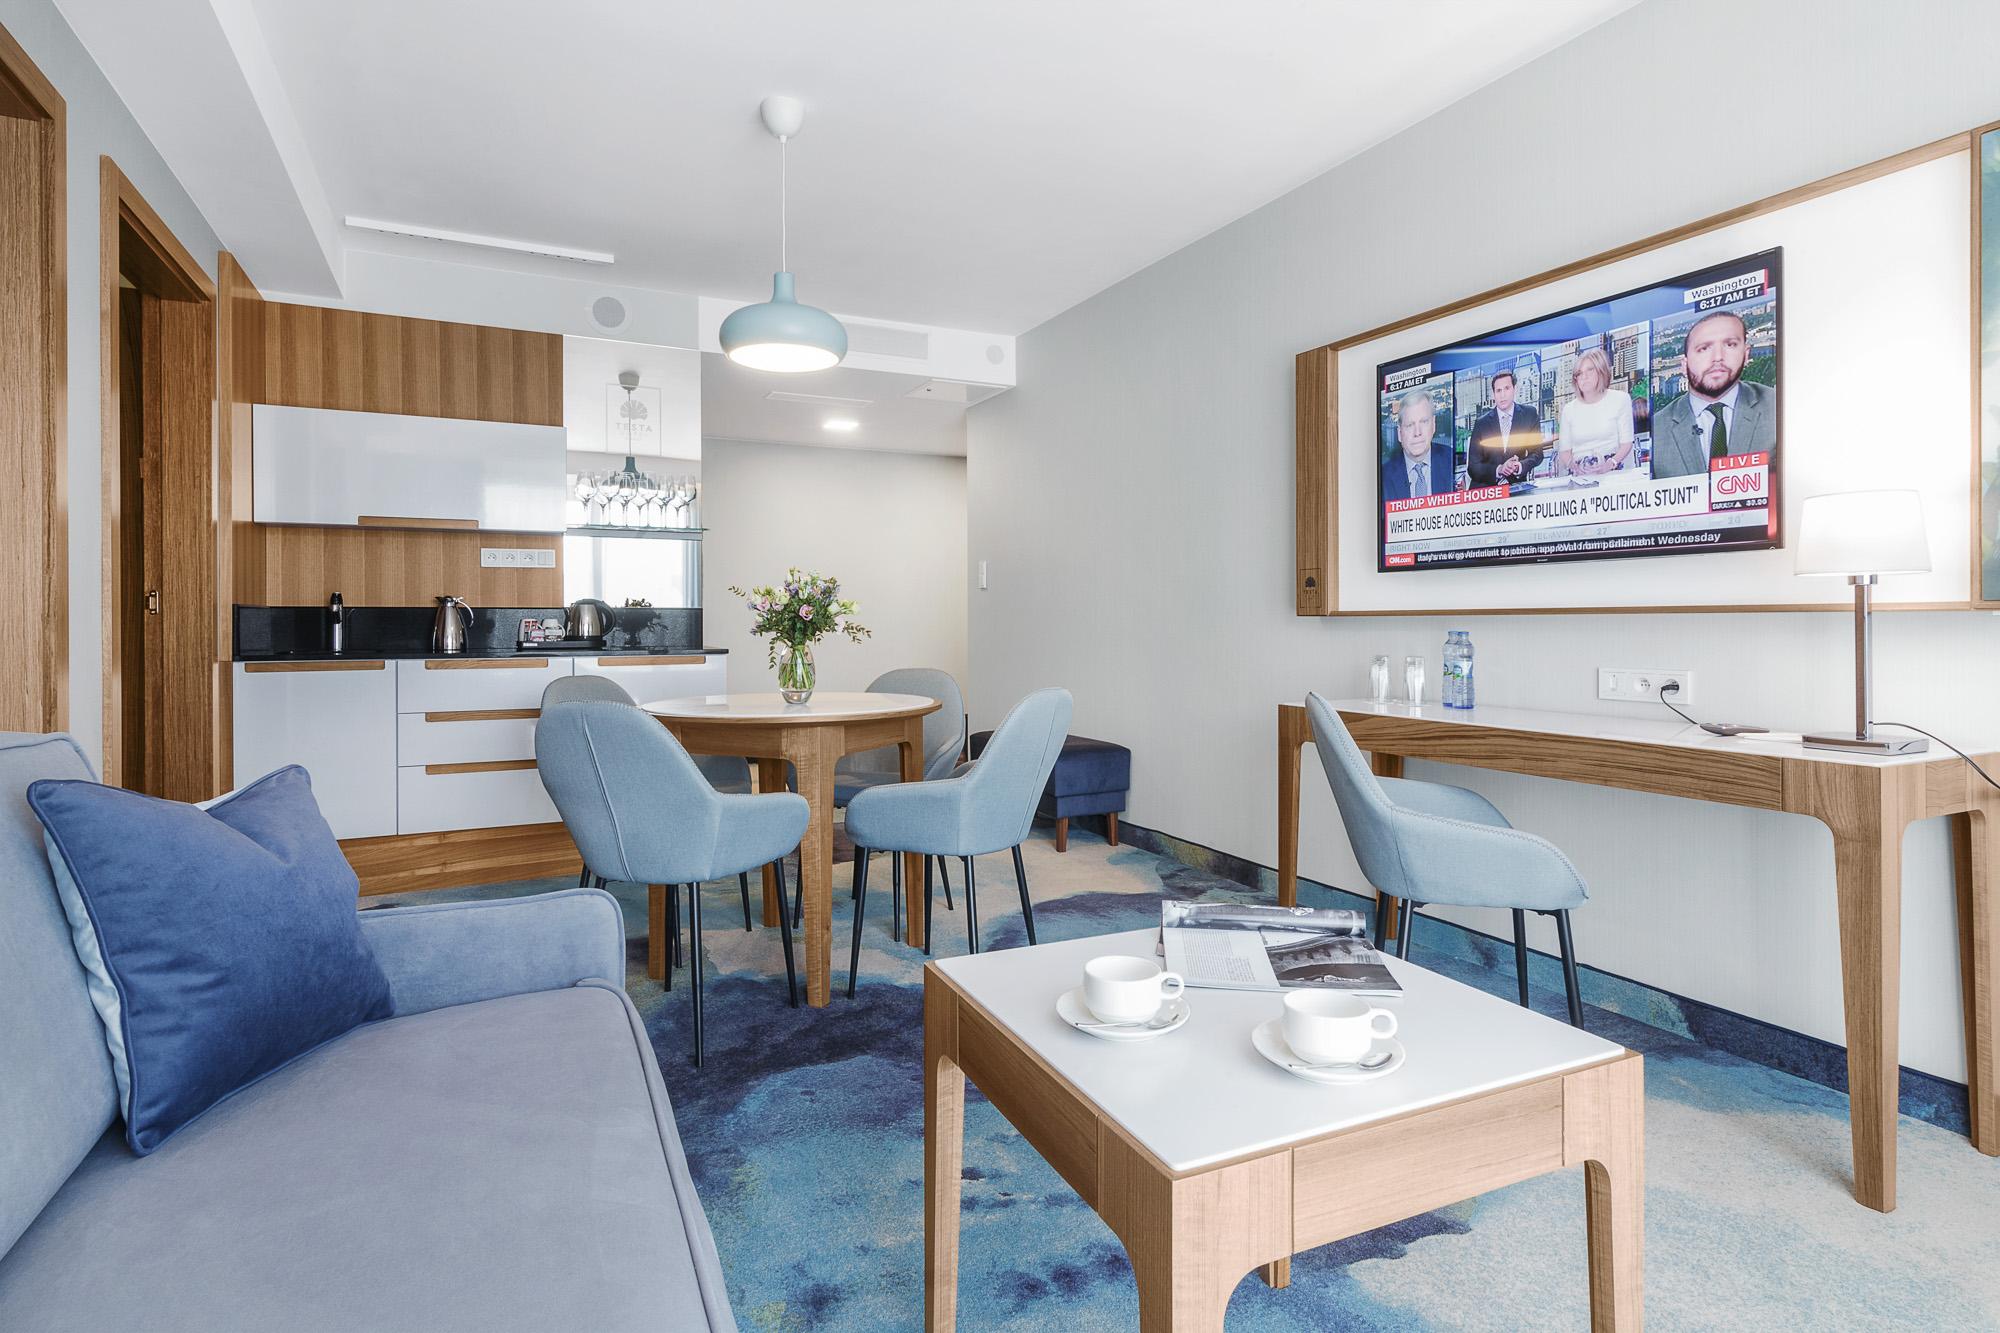 Hotel Testa - Apartament